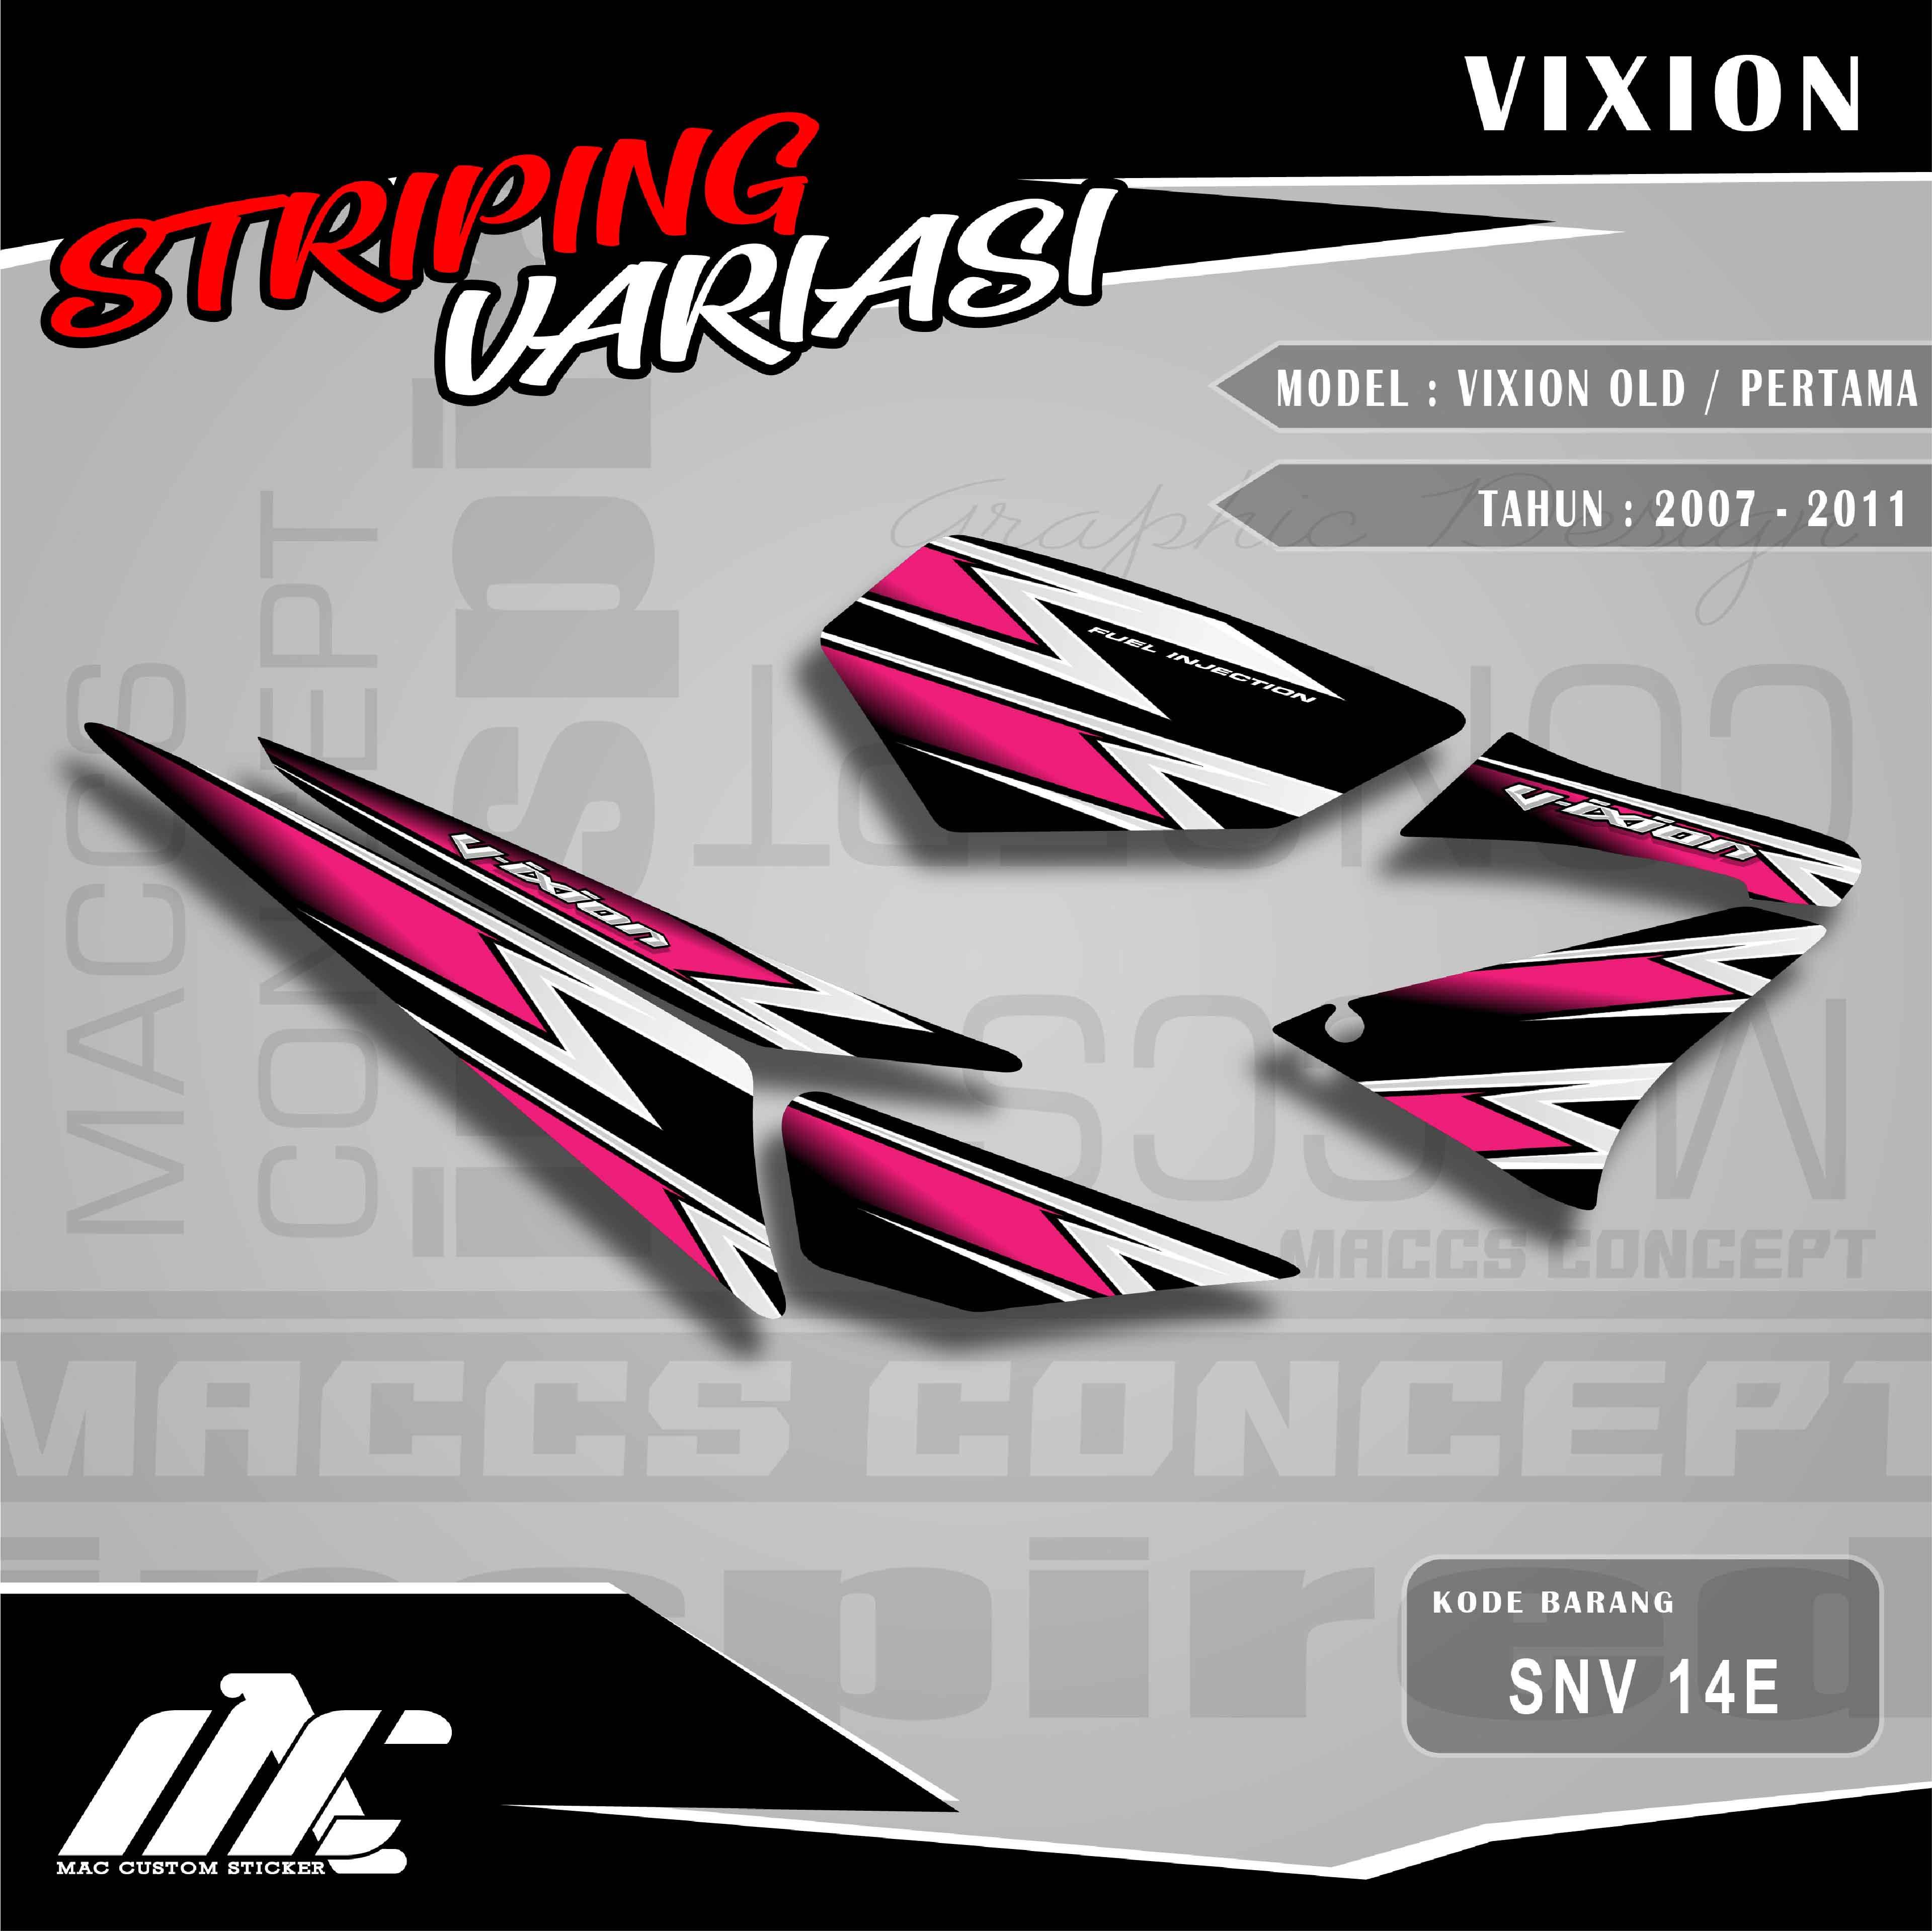 striping variasi yamaha vixion old / pertama – snv 14